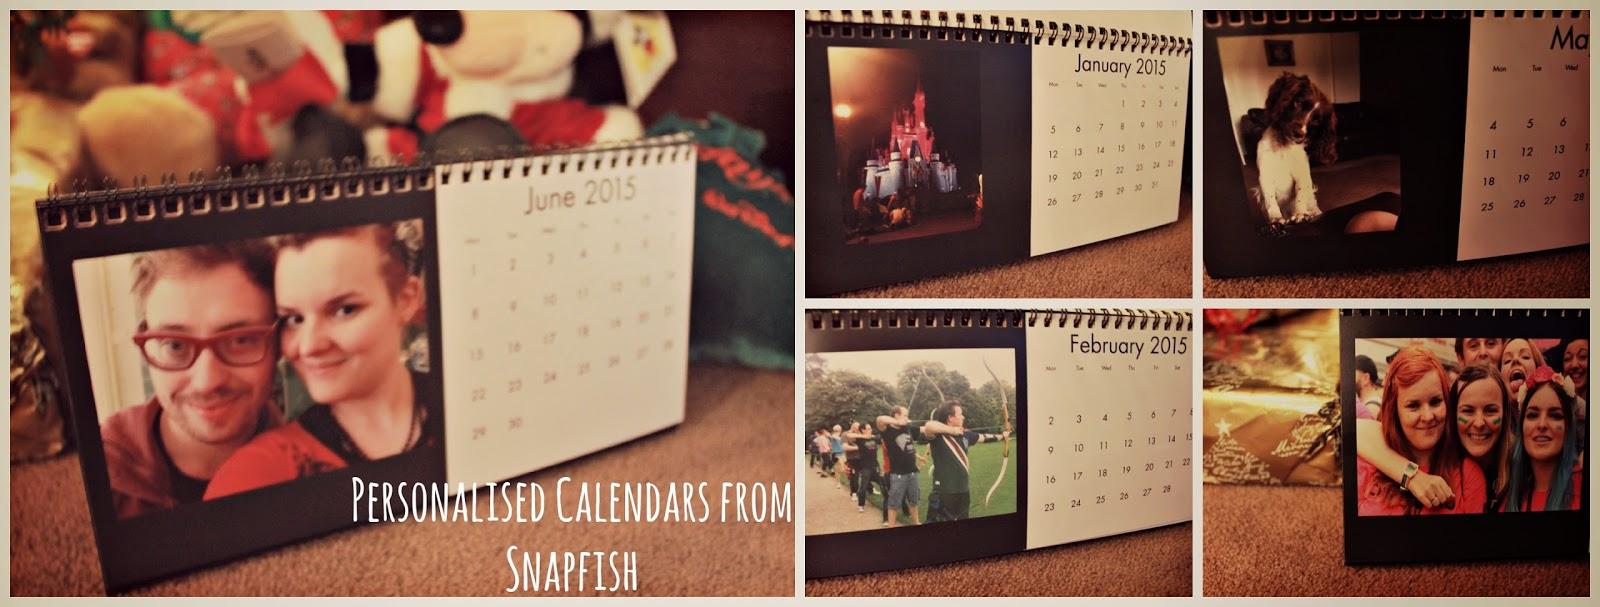 Personalised Calendars from Snapfish